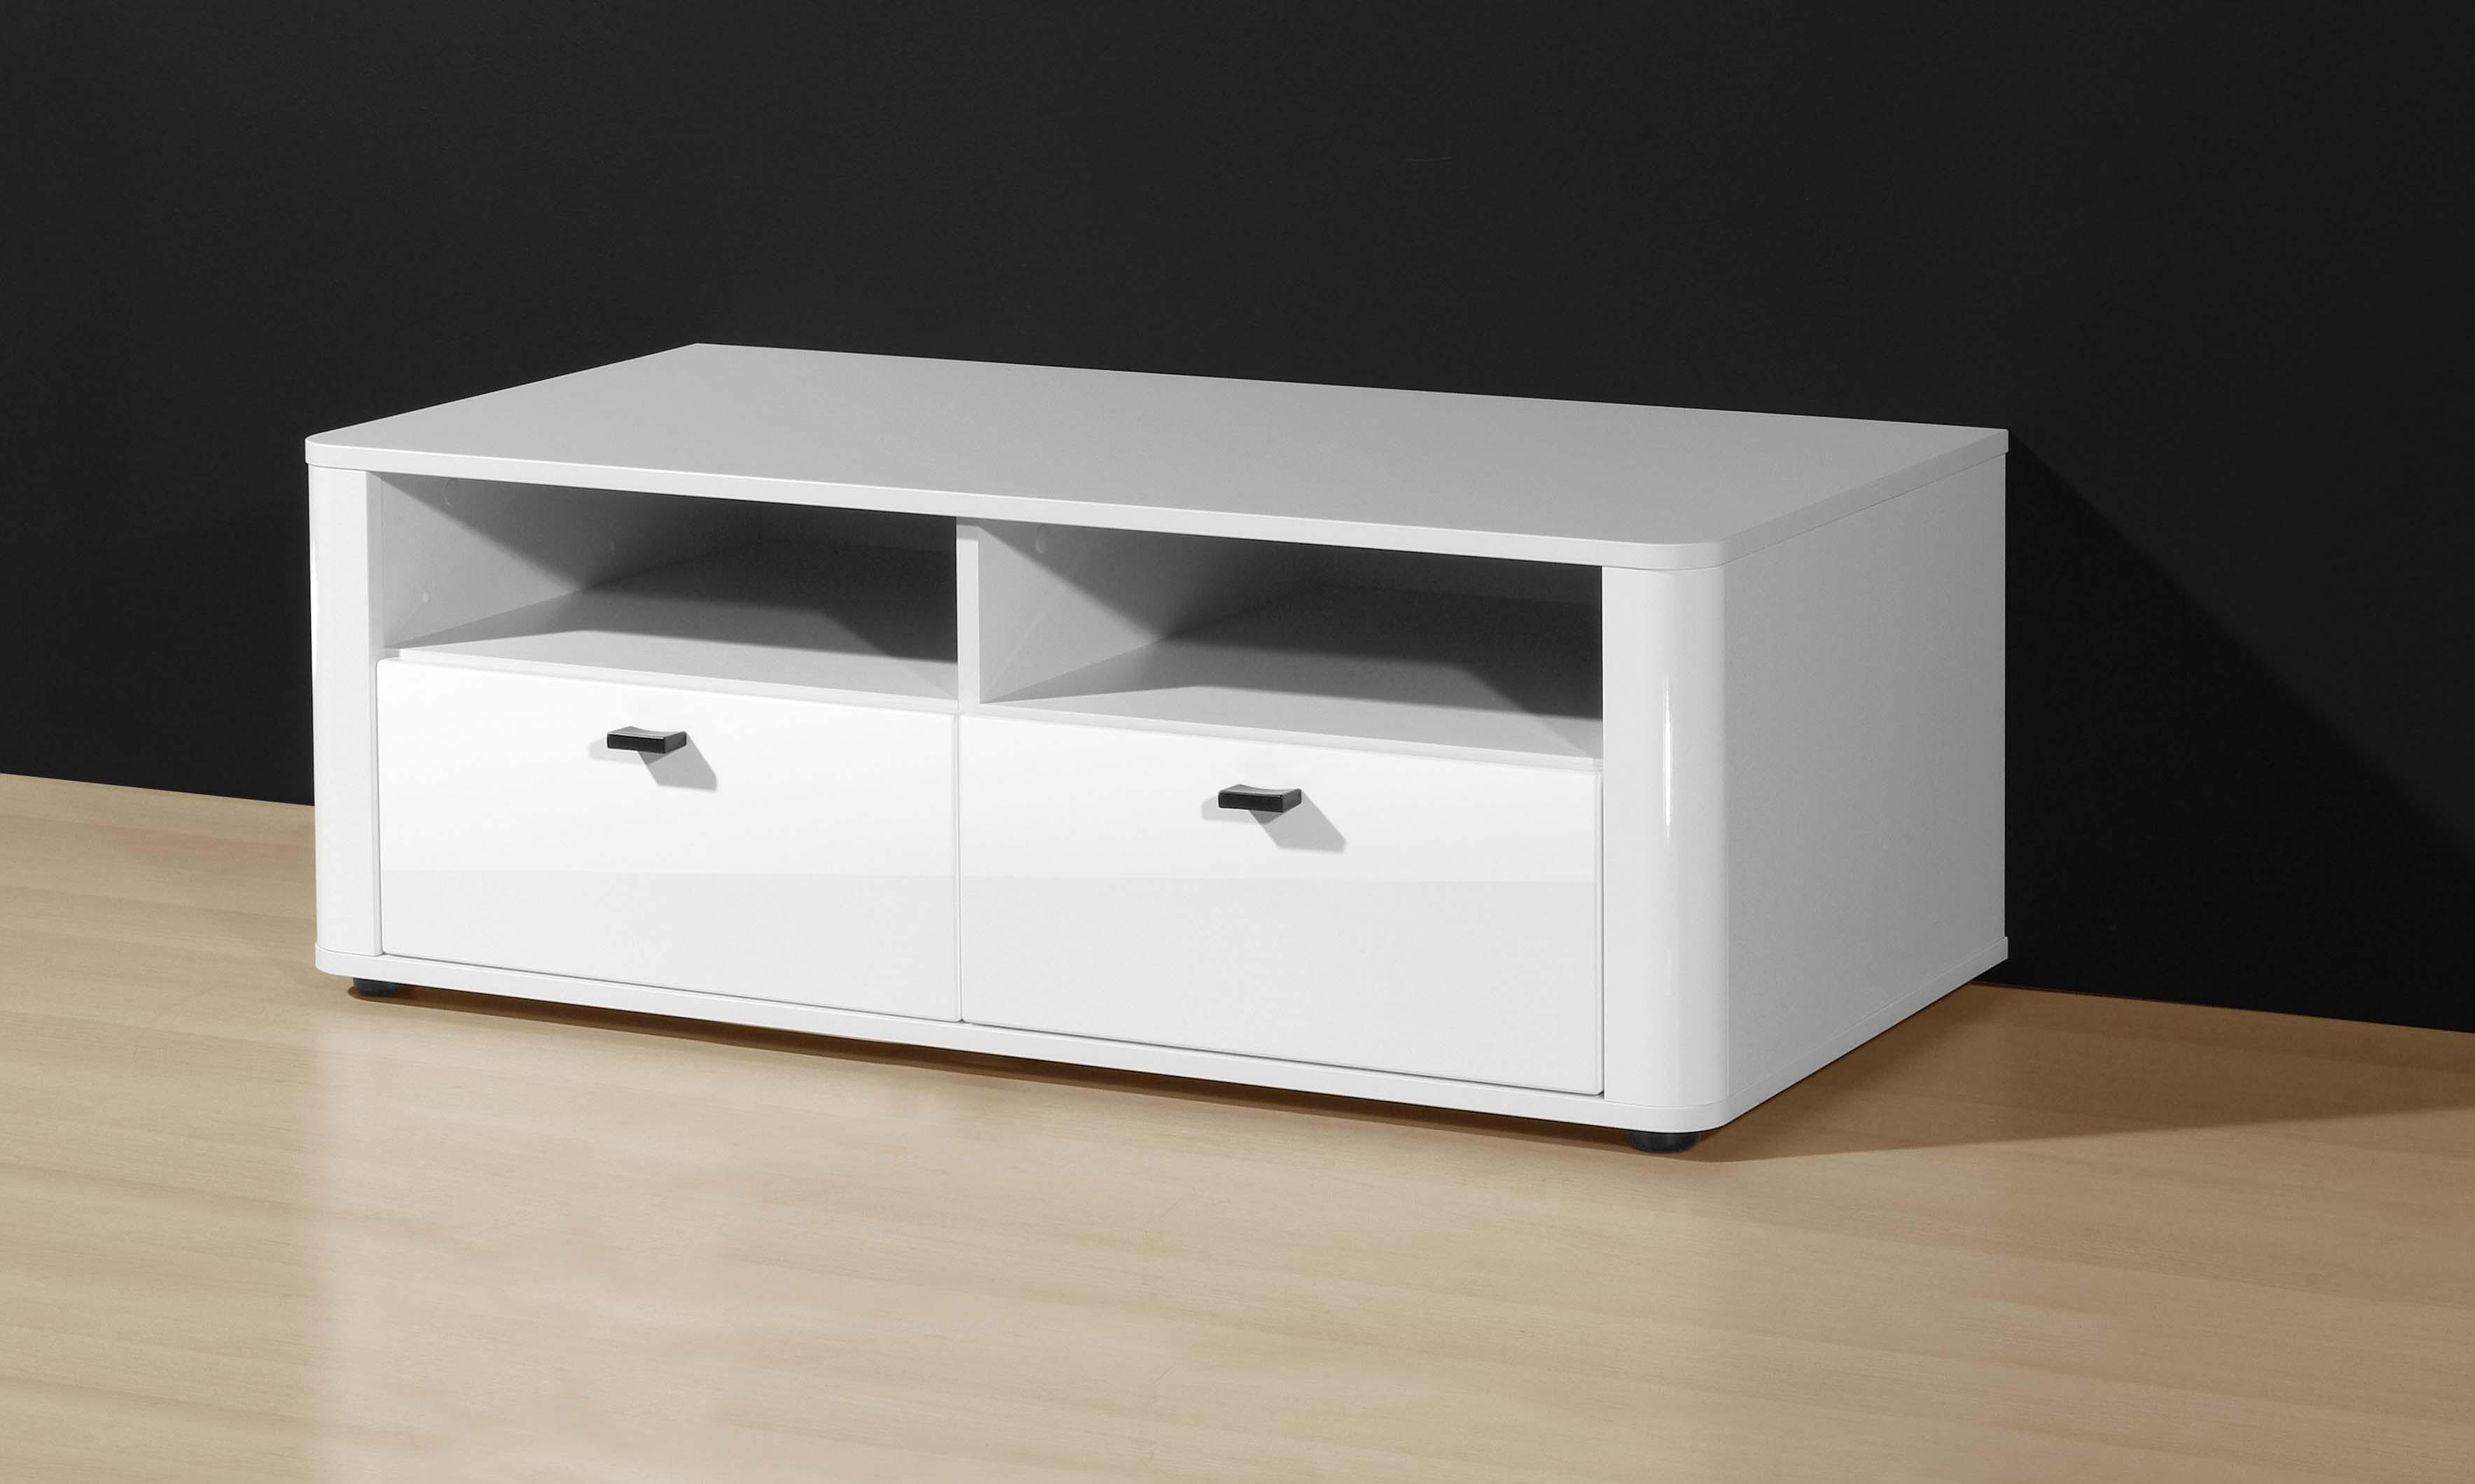 tv ablage lowboard mod tv656 weiss hochglanz h c m bel. Black Bedroom Furniture Sets. Home Design Ideas